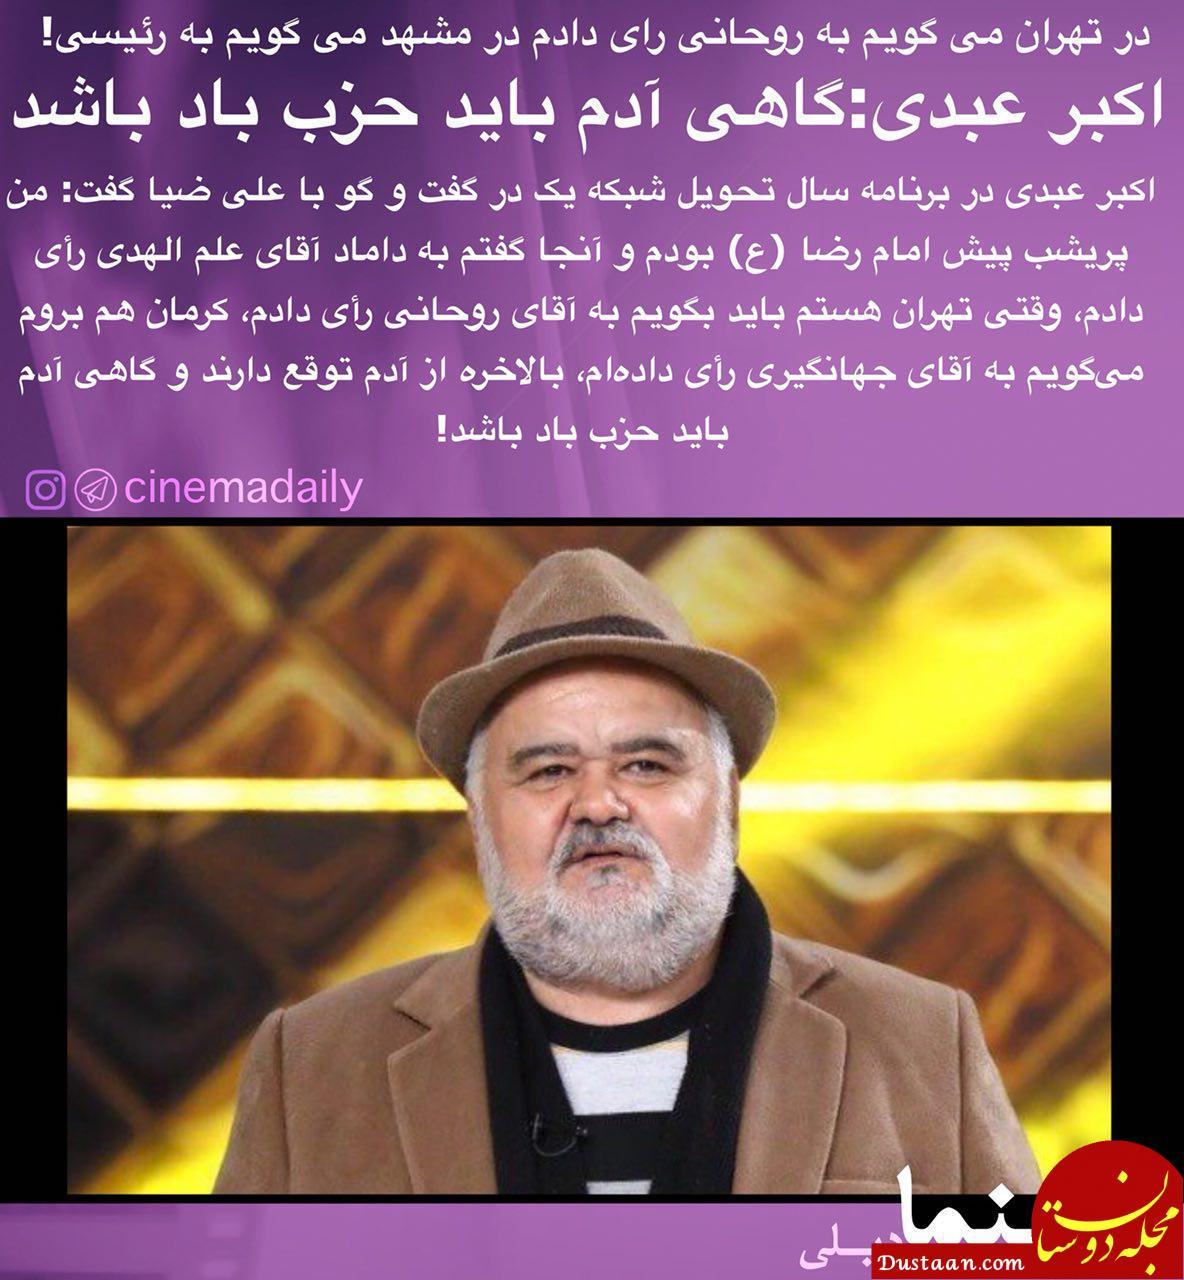 www.dustaan.com اکبر عبدی: گاهی آدم باید حزب باد باشد! +عکس